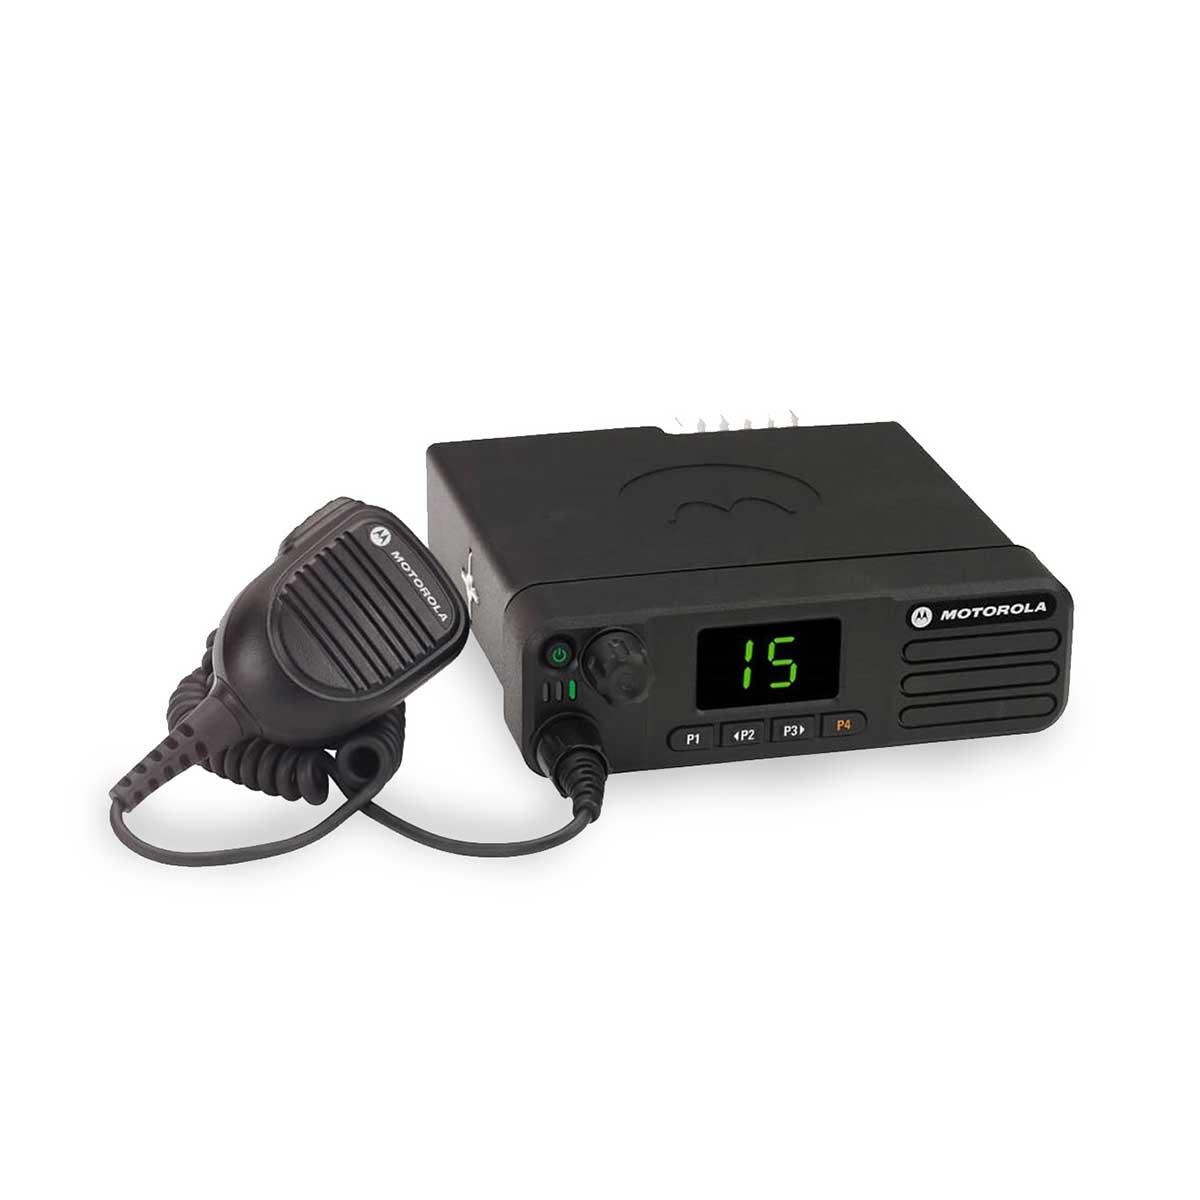 Radio Motorola DGM8000e Digital LAM28JNC9RA1AN VHF 136-174 MHZ de 25W